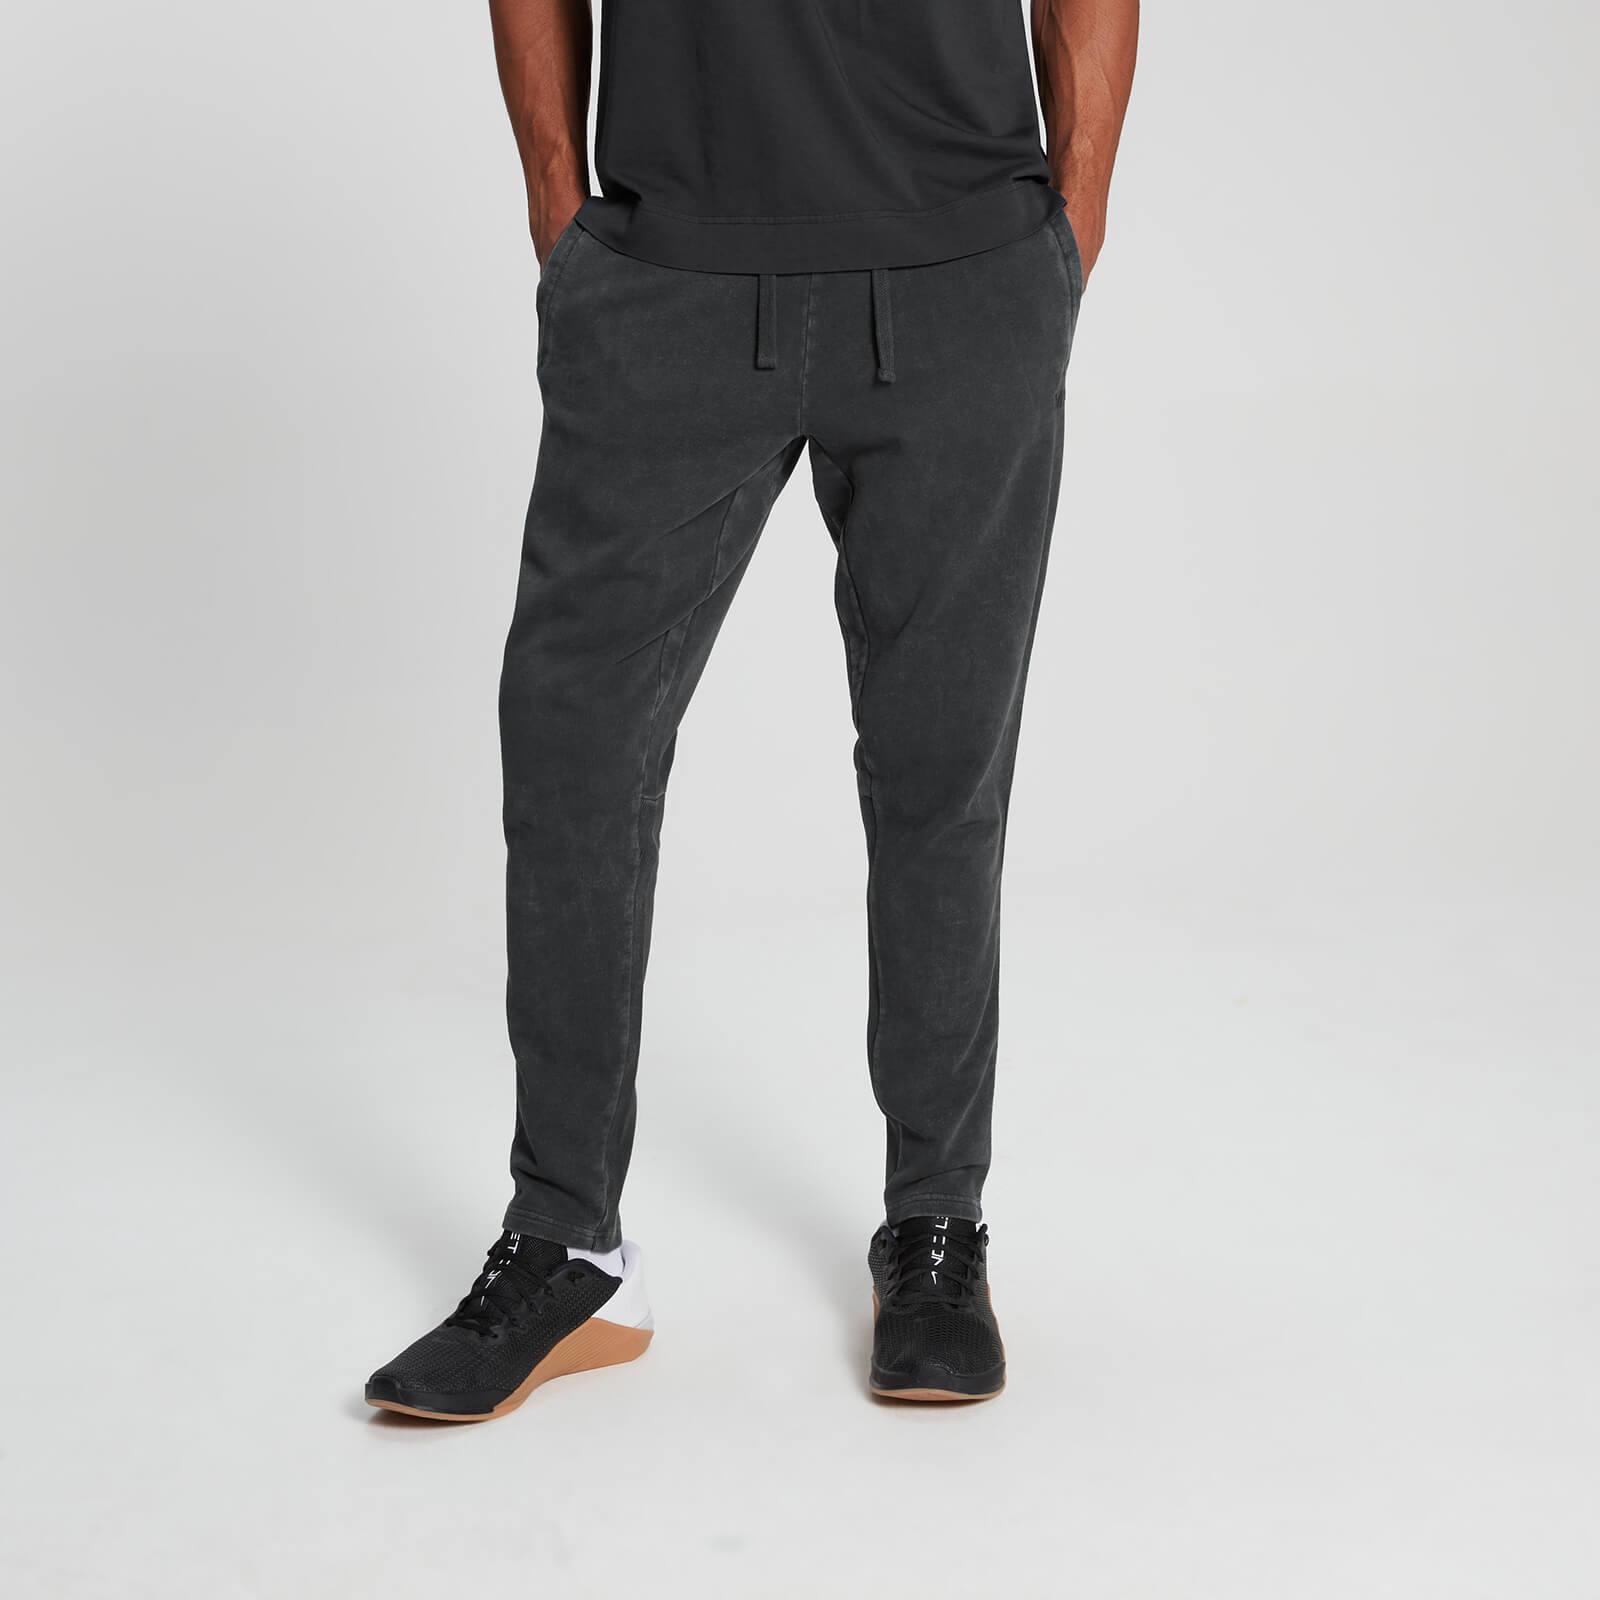 Mp Pantalón deportivo Raw Training para hombre - Negro lavado - S